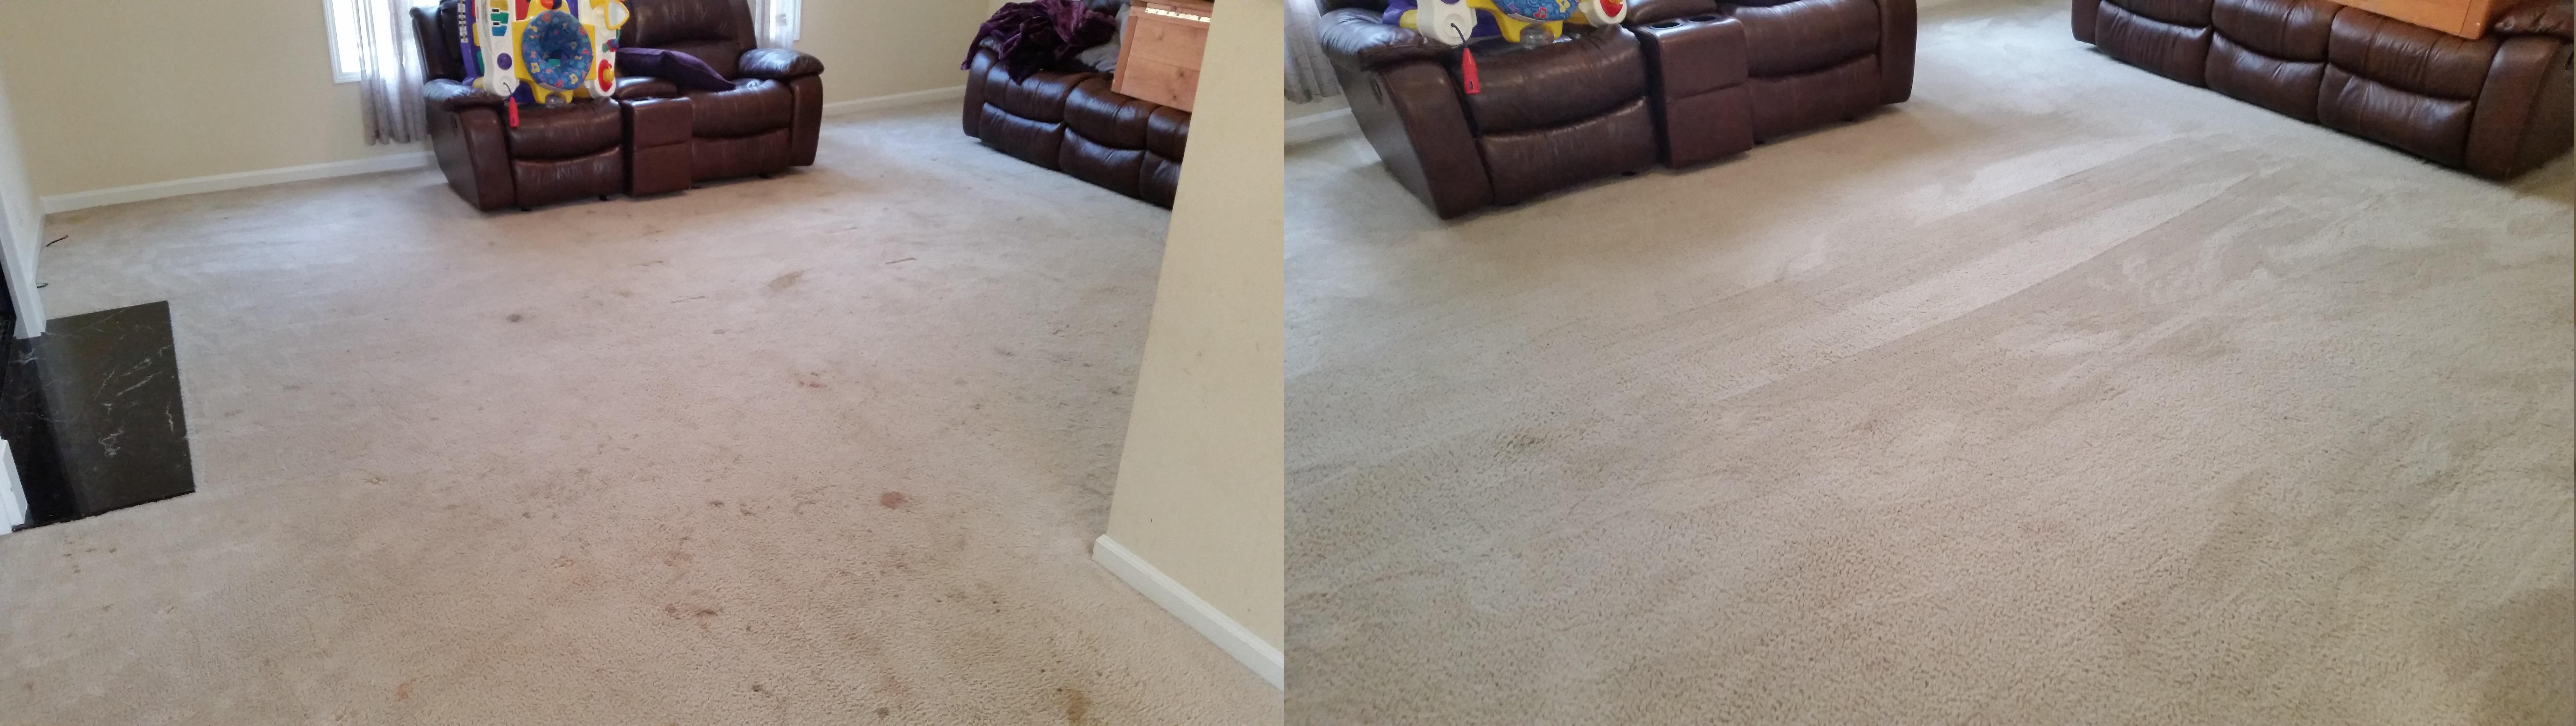 11-10-14-b-a-citrusolution-carpet-cleaning-suwanee-10